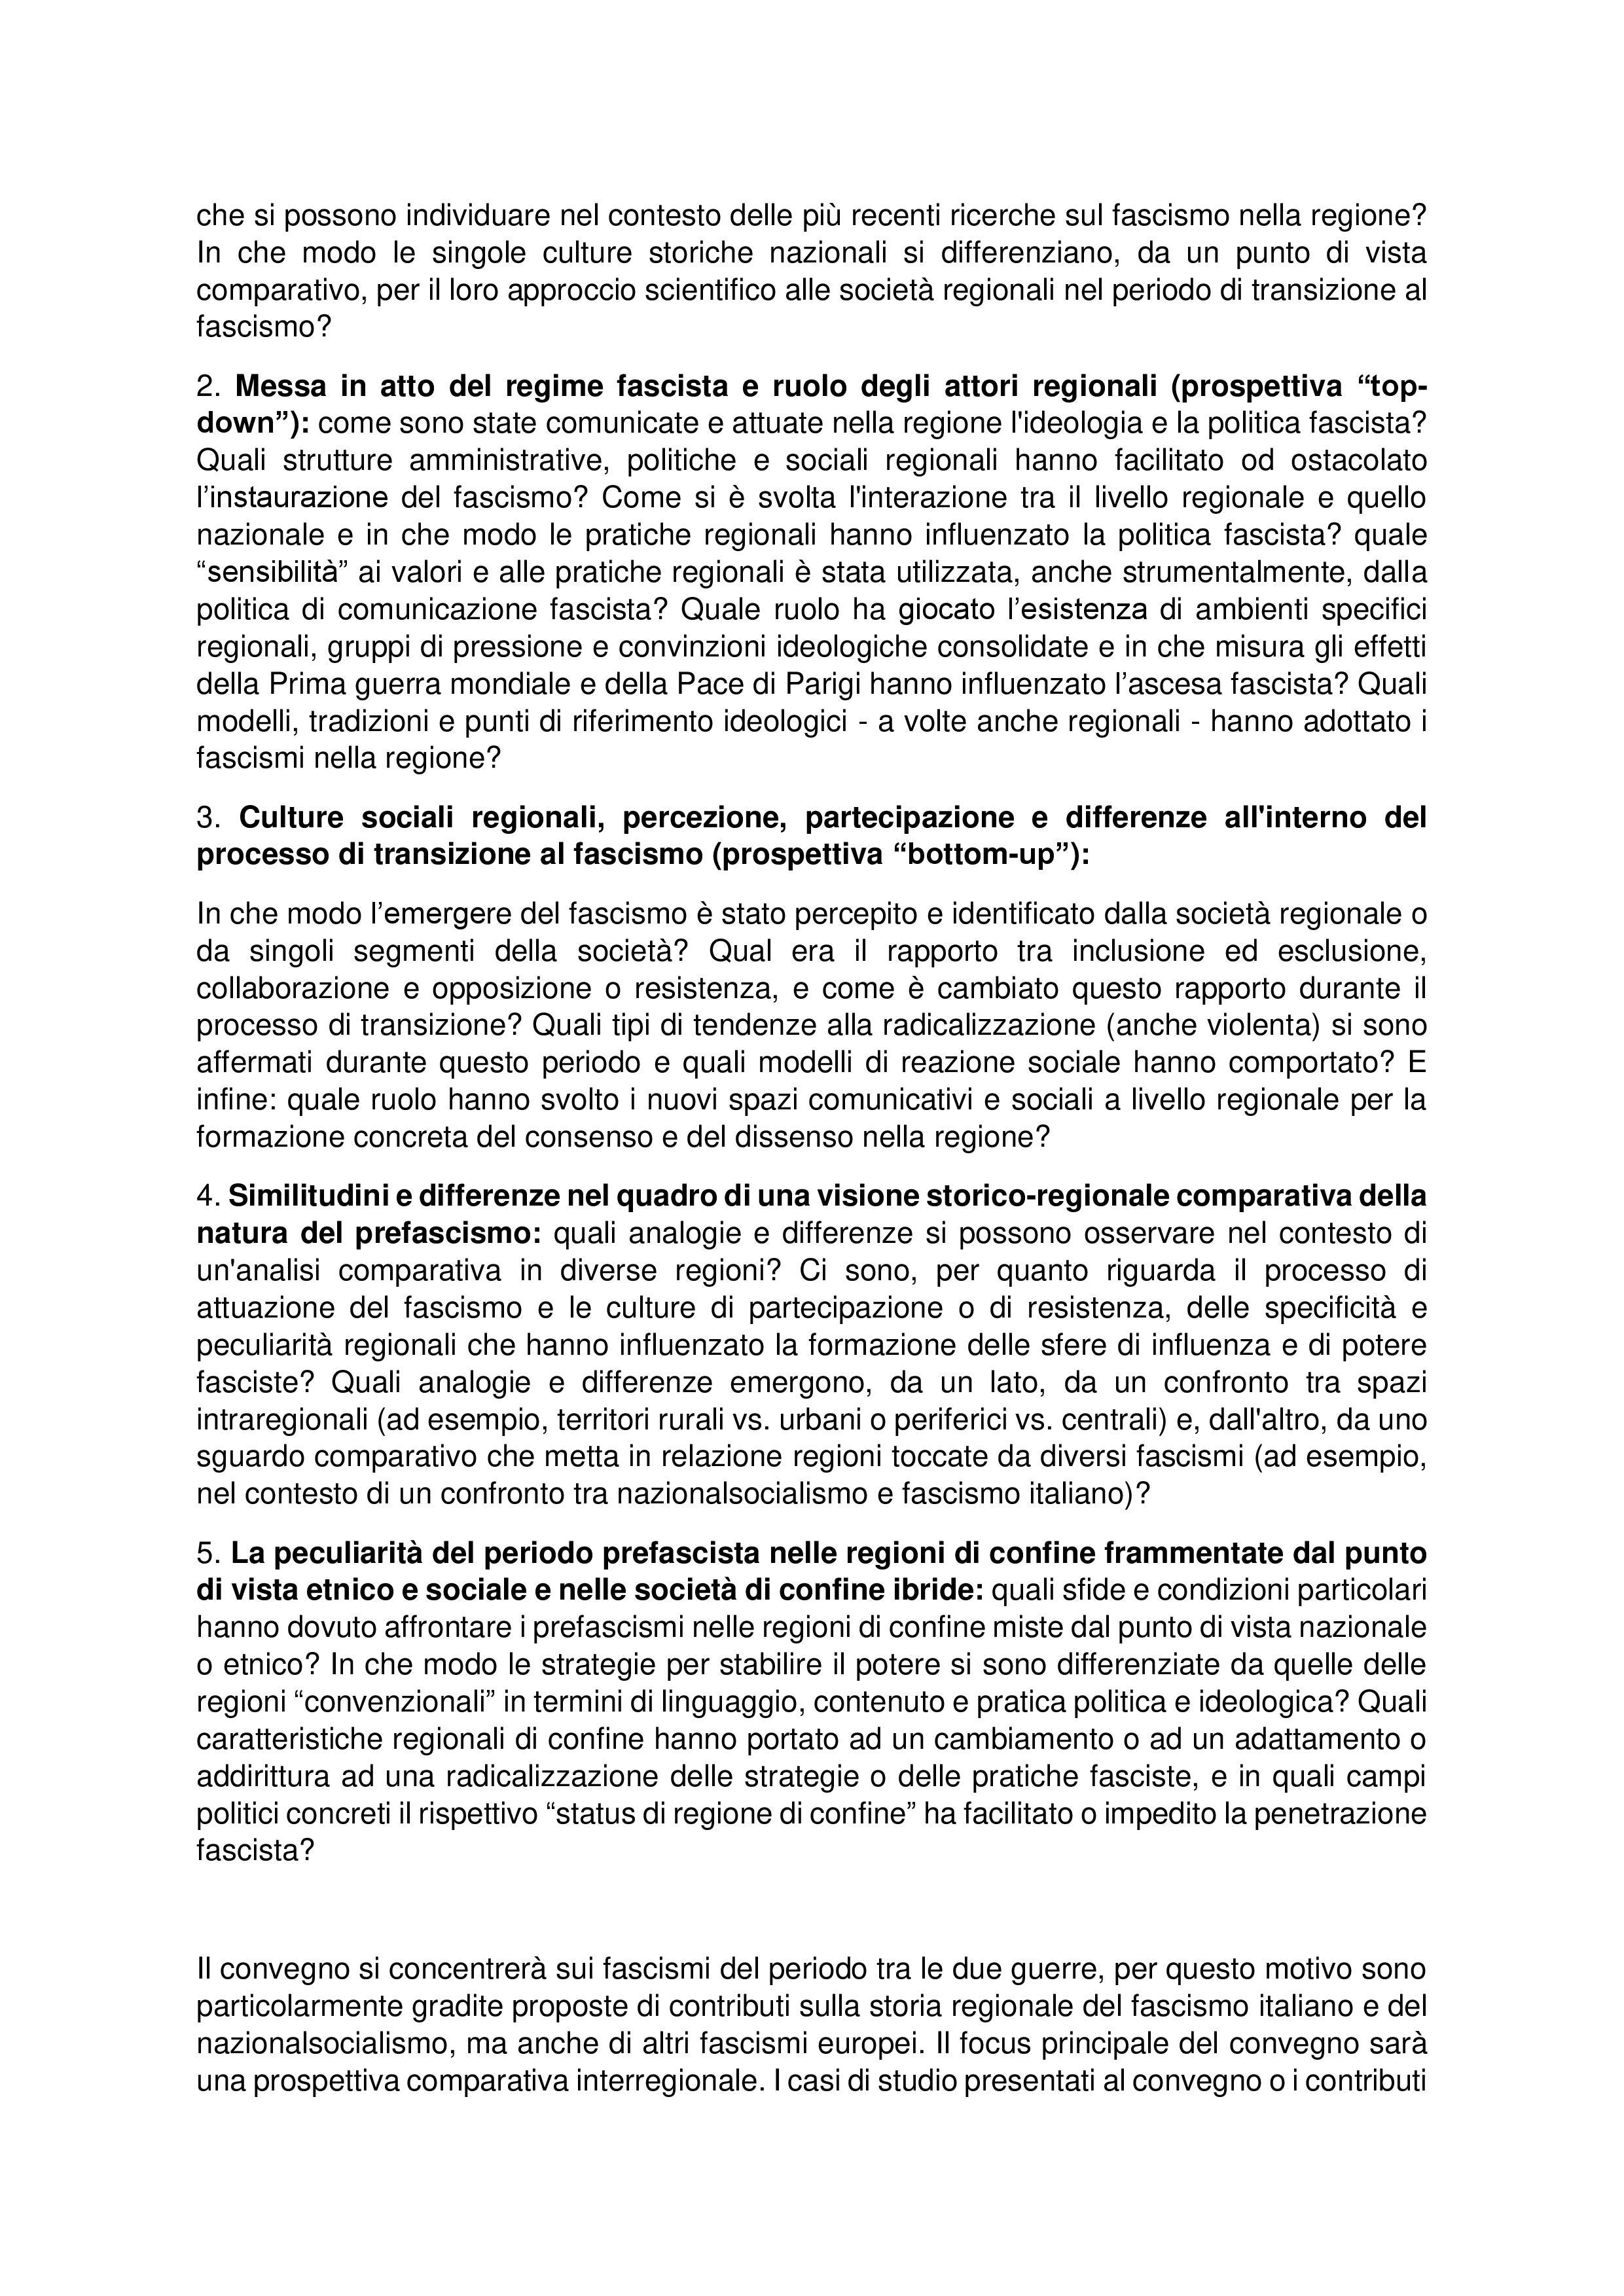 CfP_Prefascismi-page-002